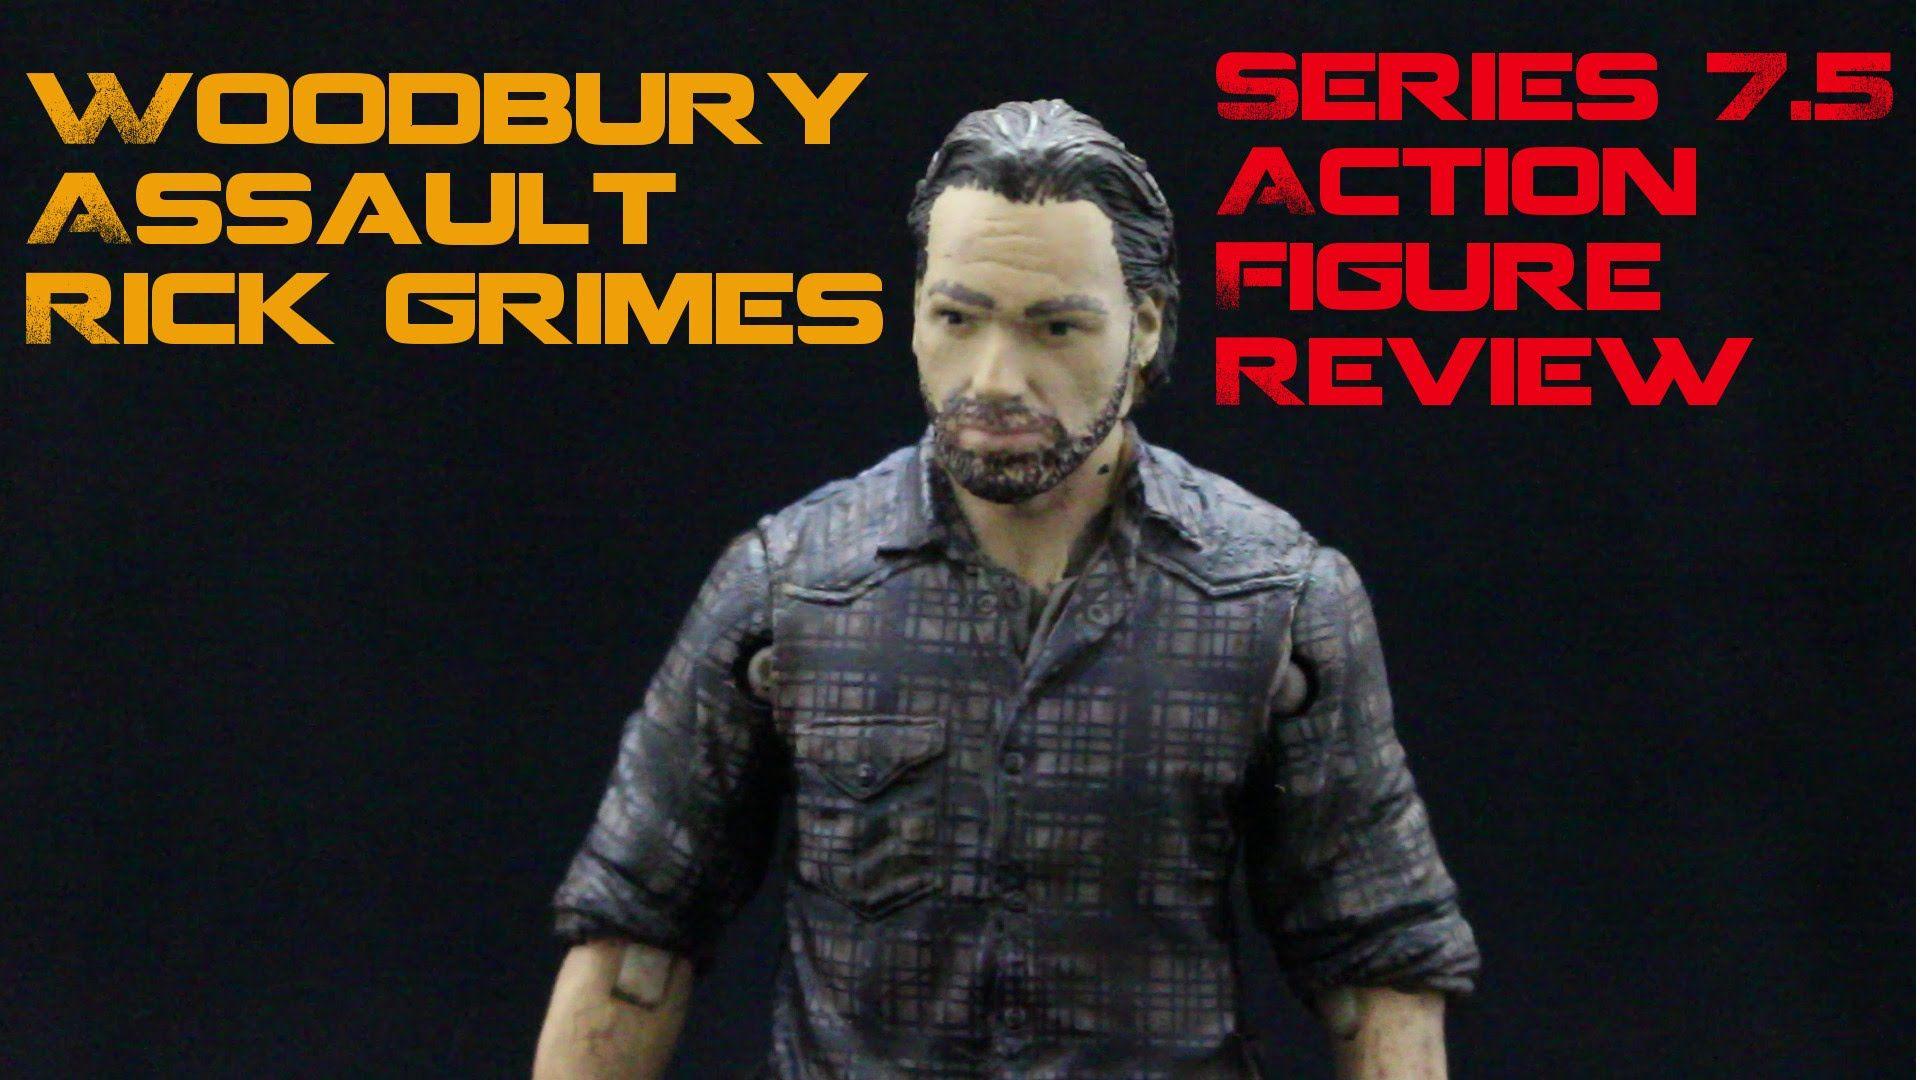 The Walking Dead Woodbury Assault Rick Grimes Action Figure Review